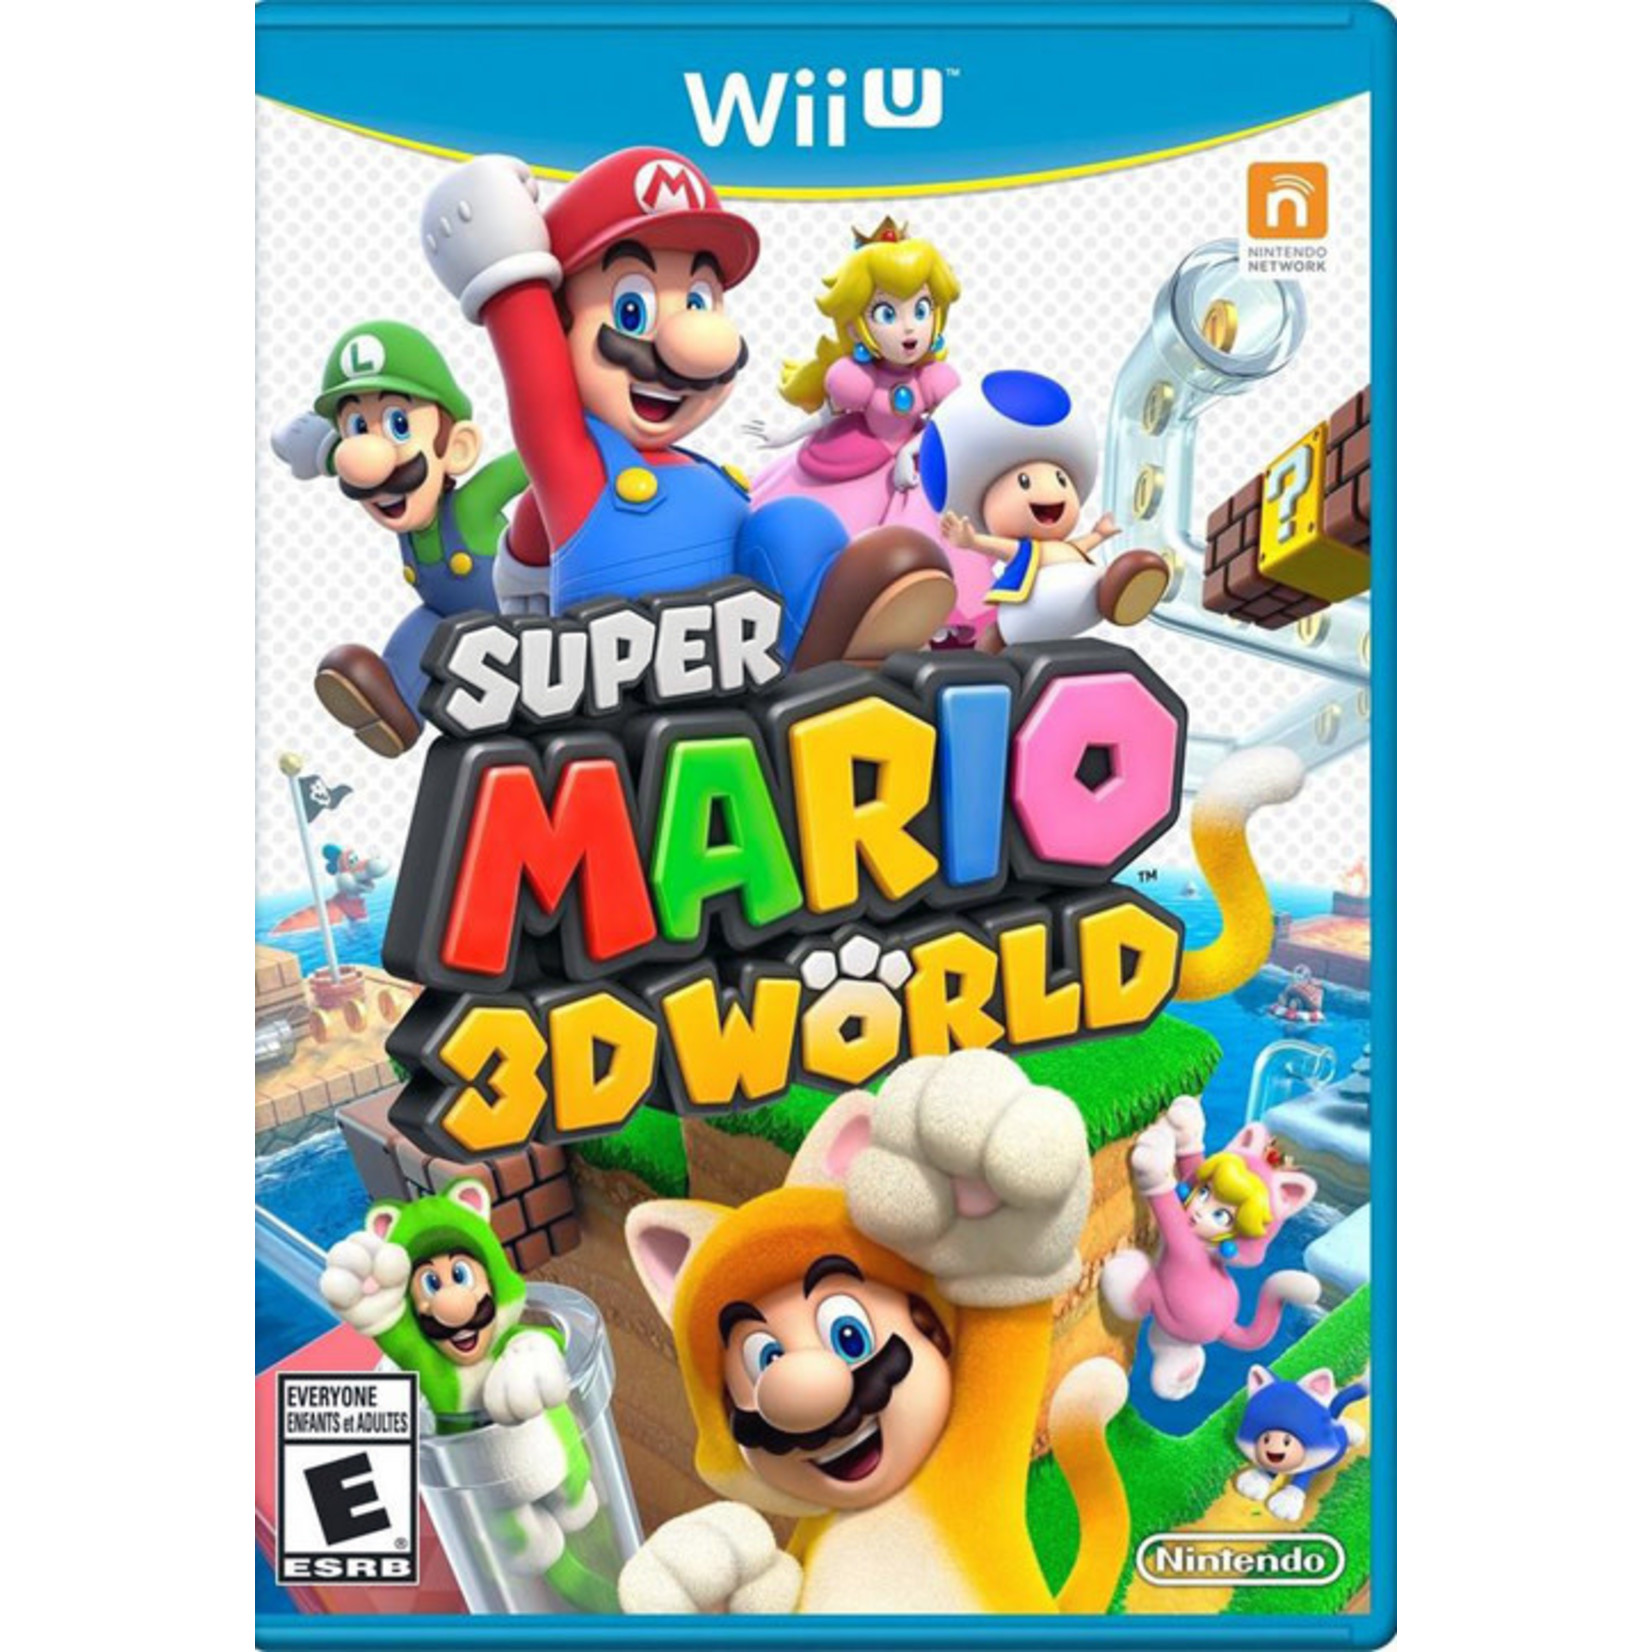 WIIUUSD-Super Mario 3D World